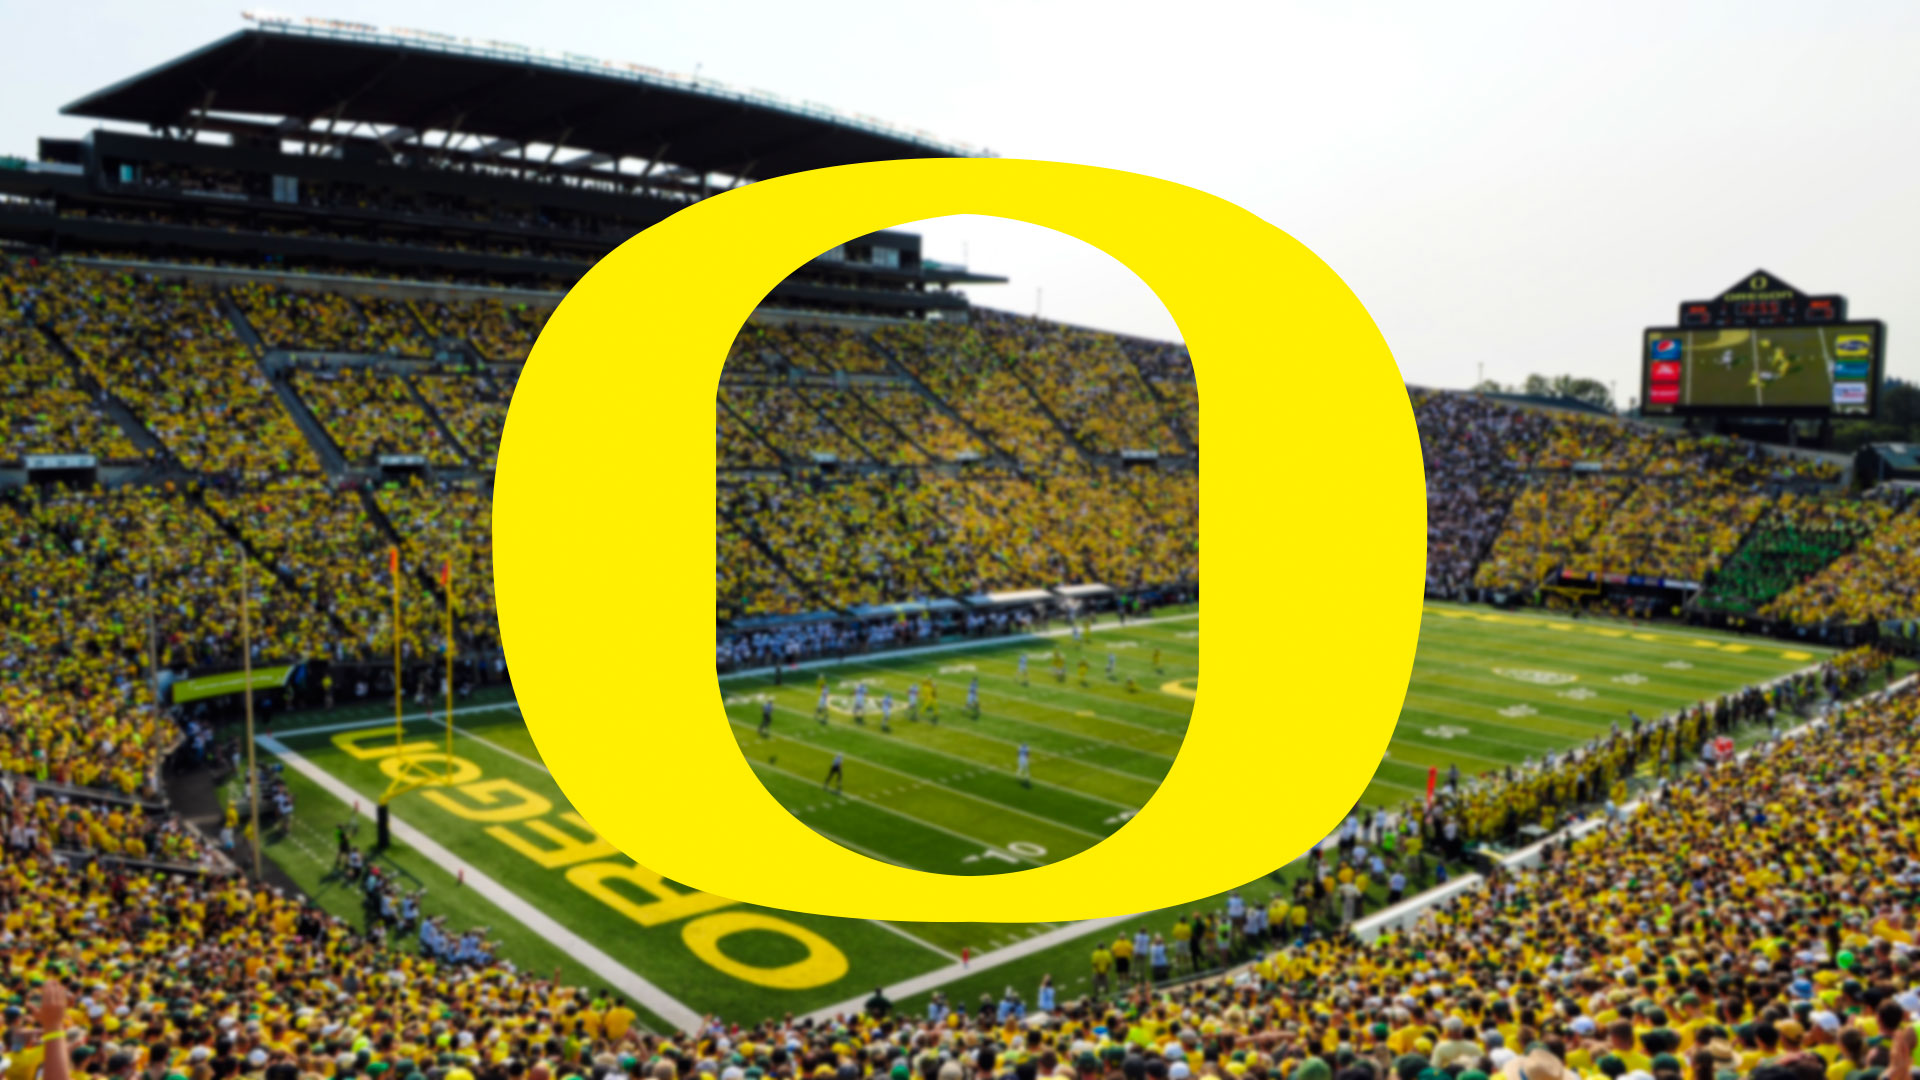 Oregon-stadium-042415-GETTY-FTR.jpg